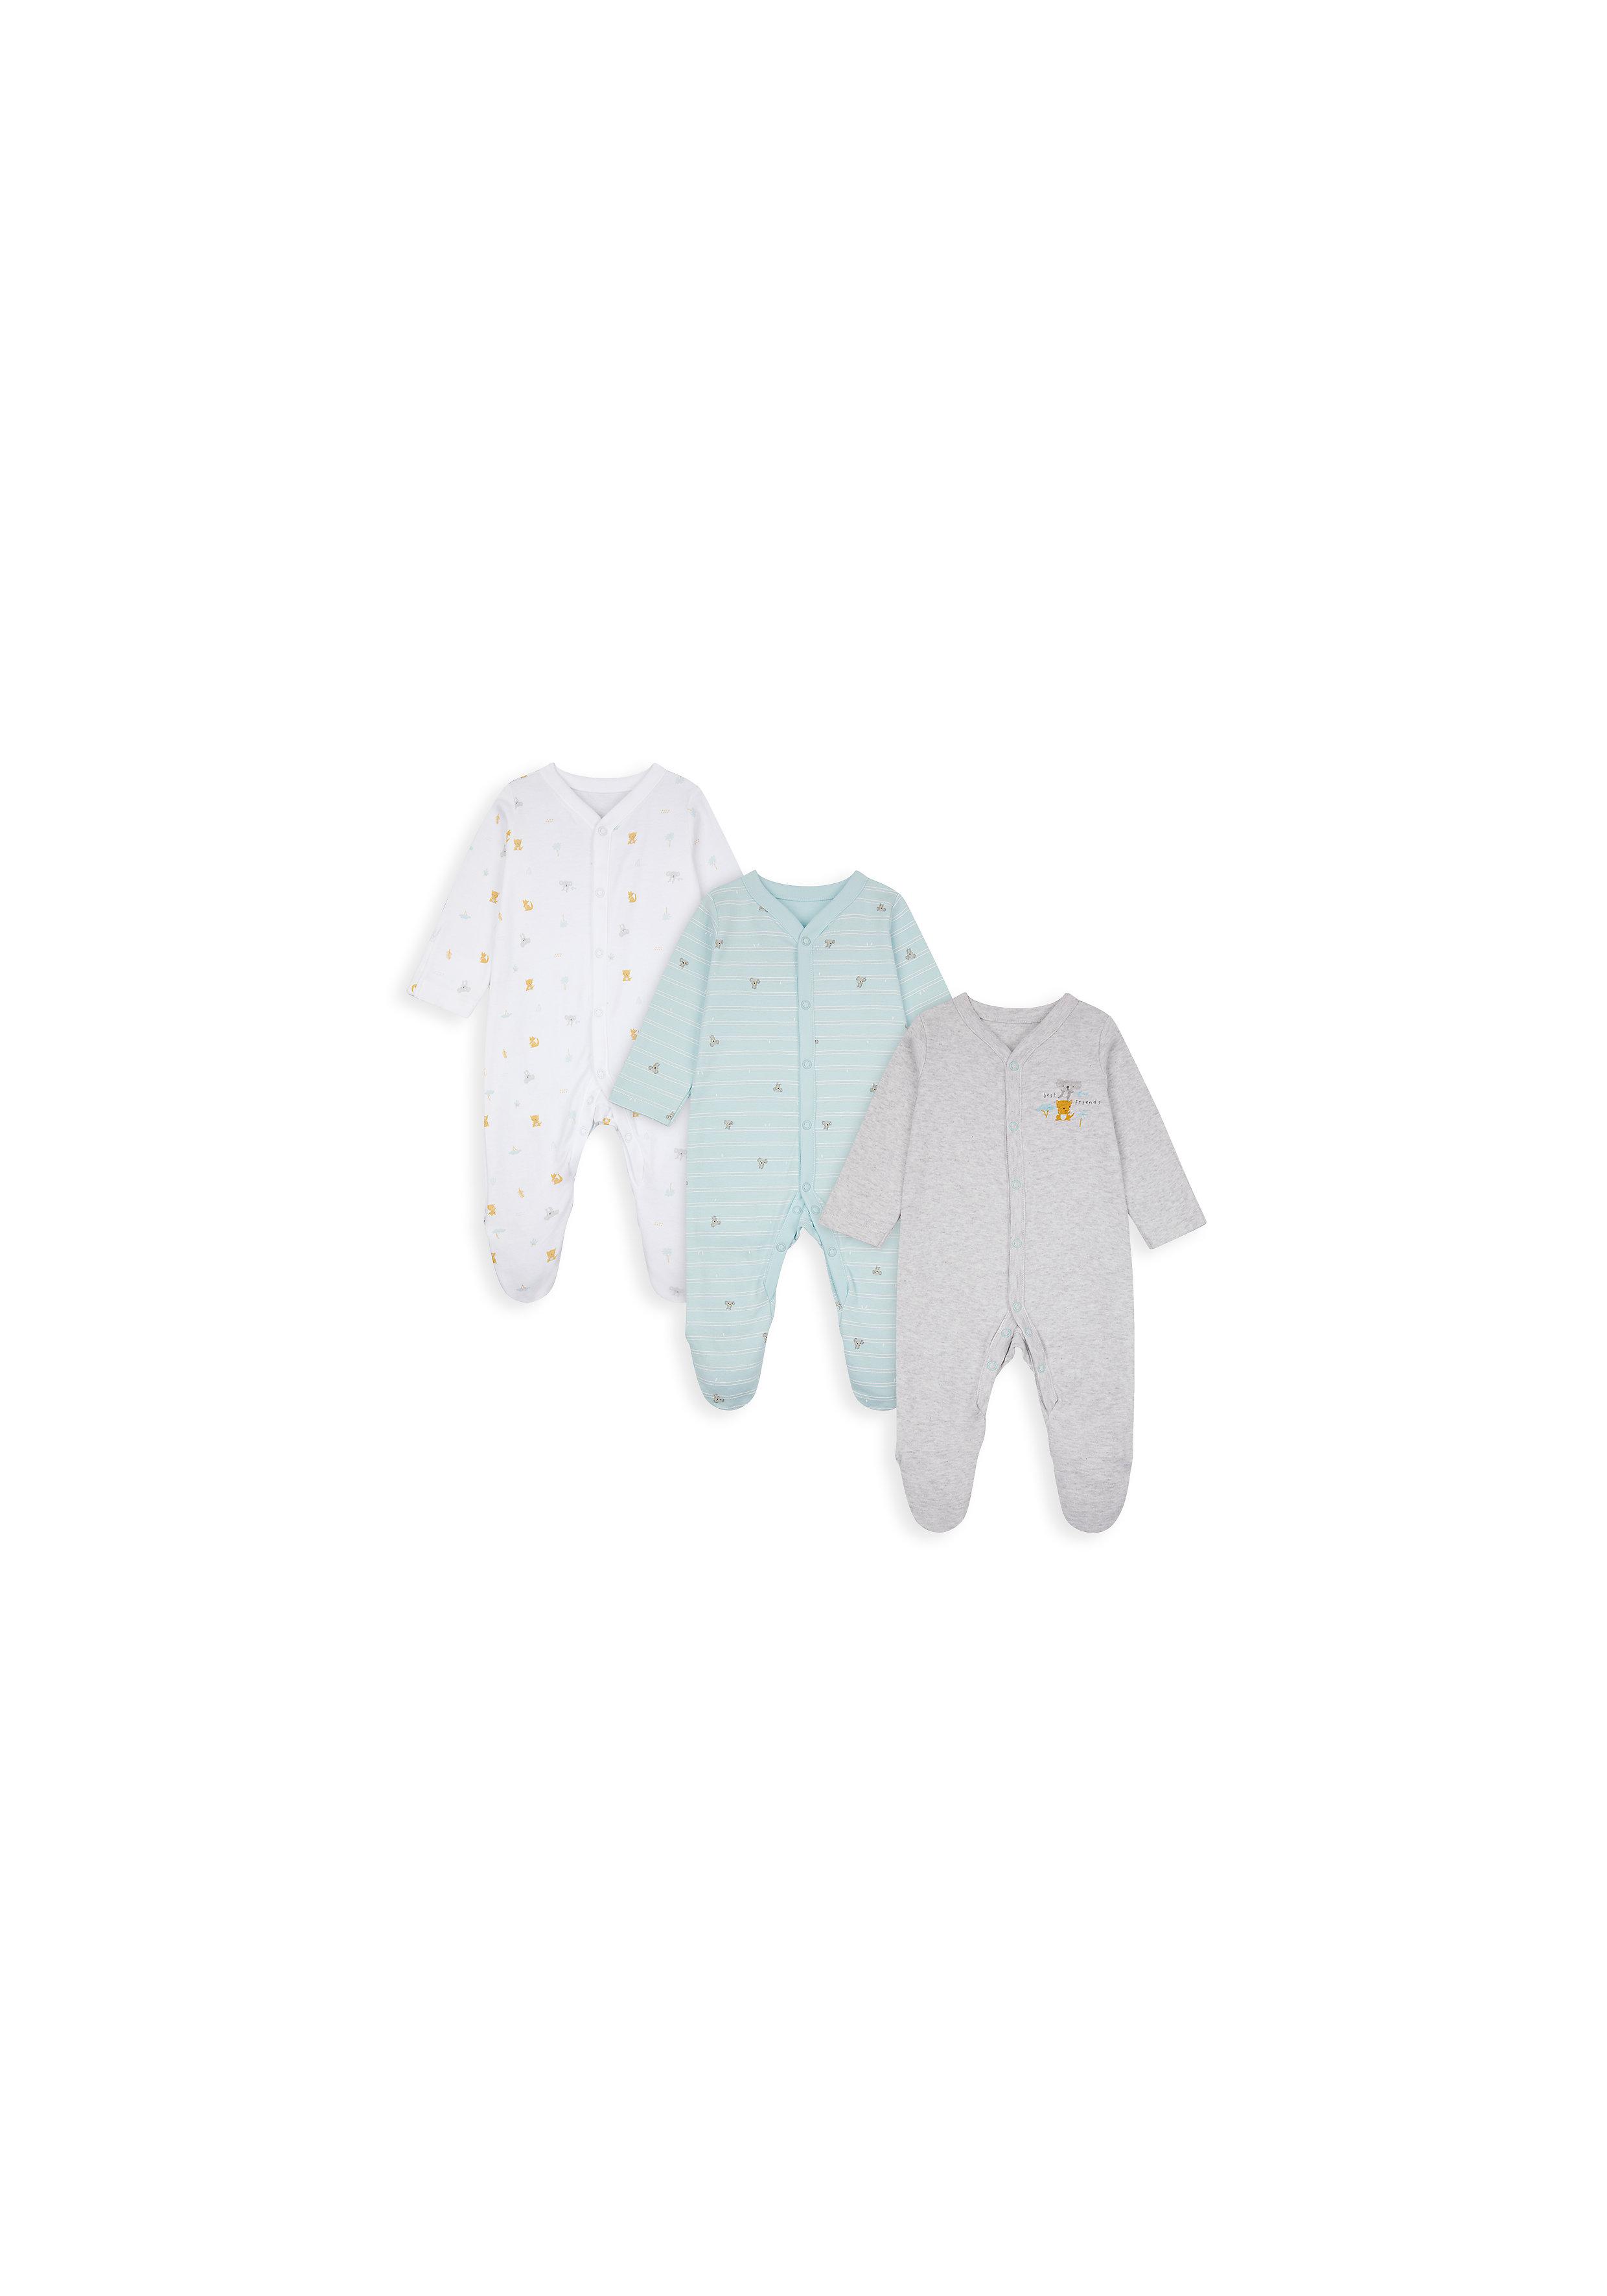 Mothercare | Unisex Full Sleeves Sleepsuit Koala Print - Pack Of 3 - Multicolor